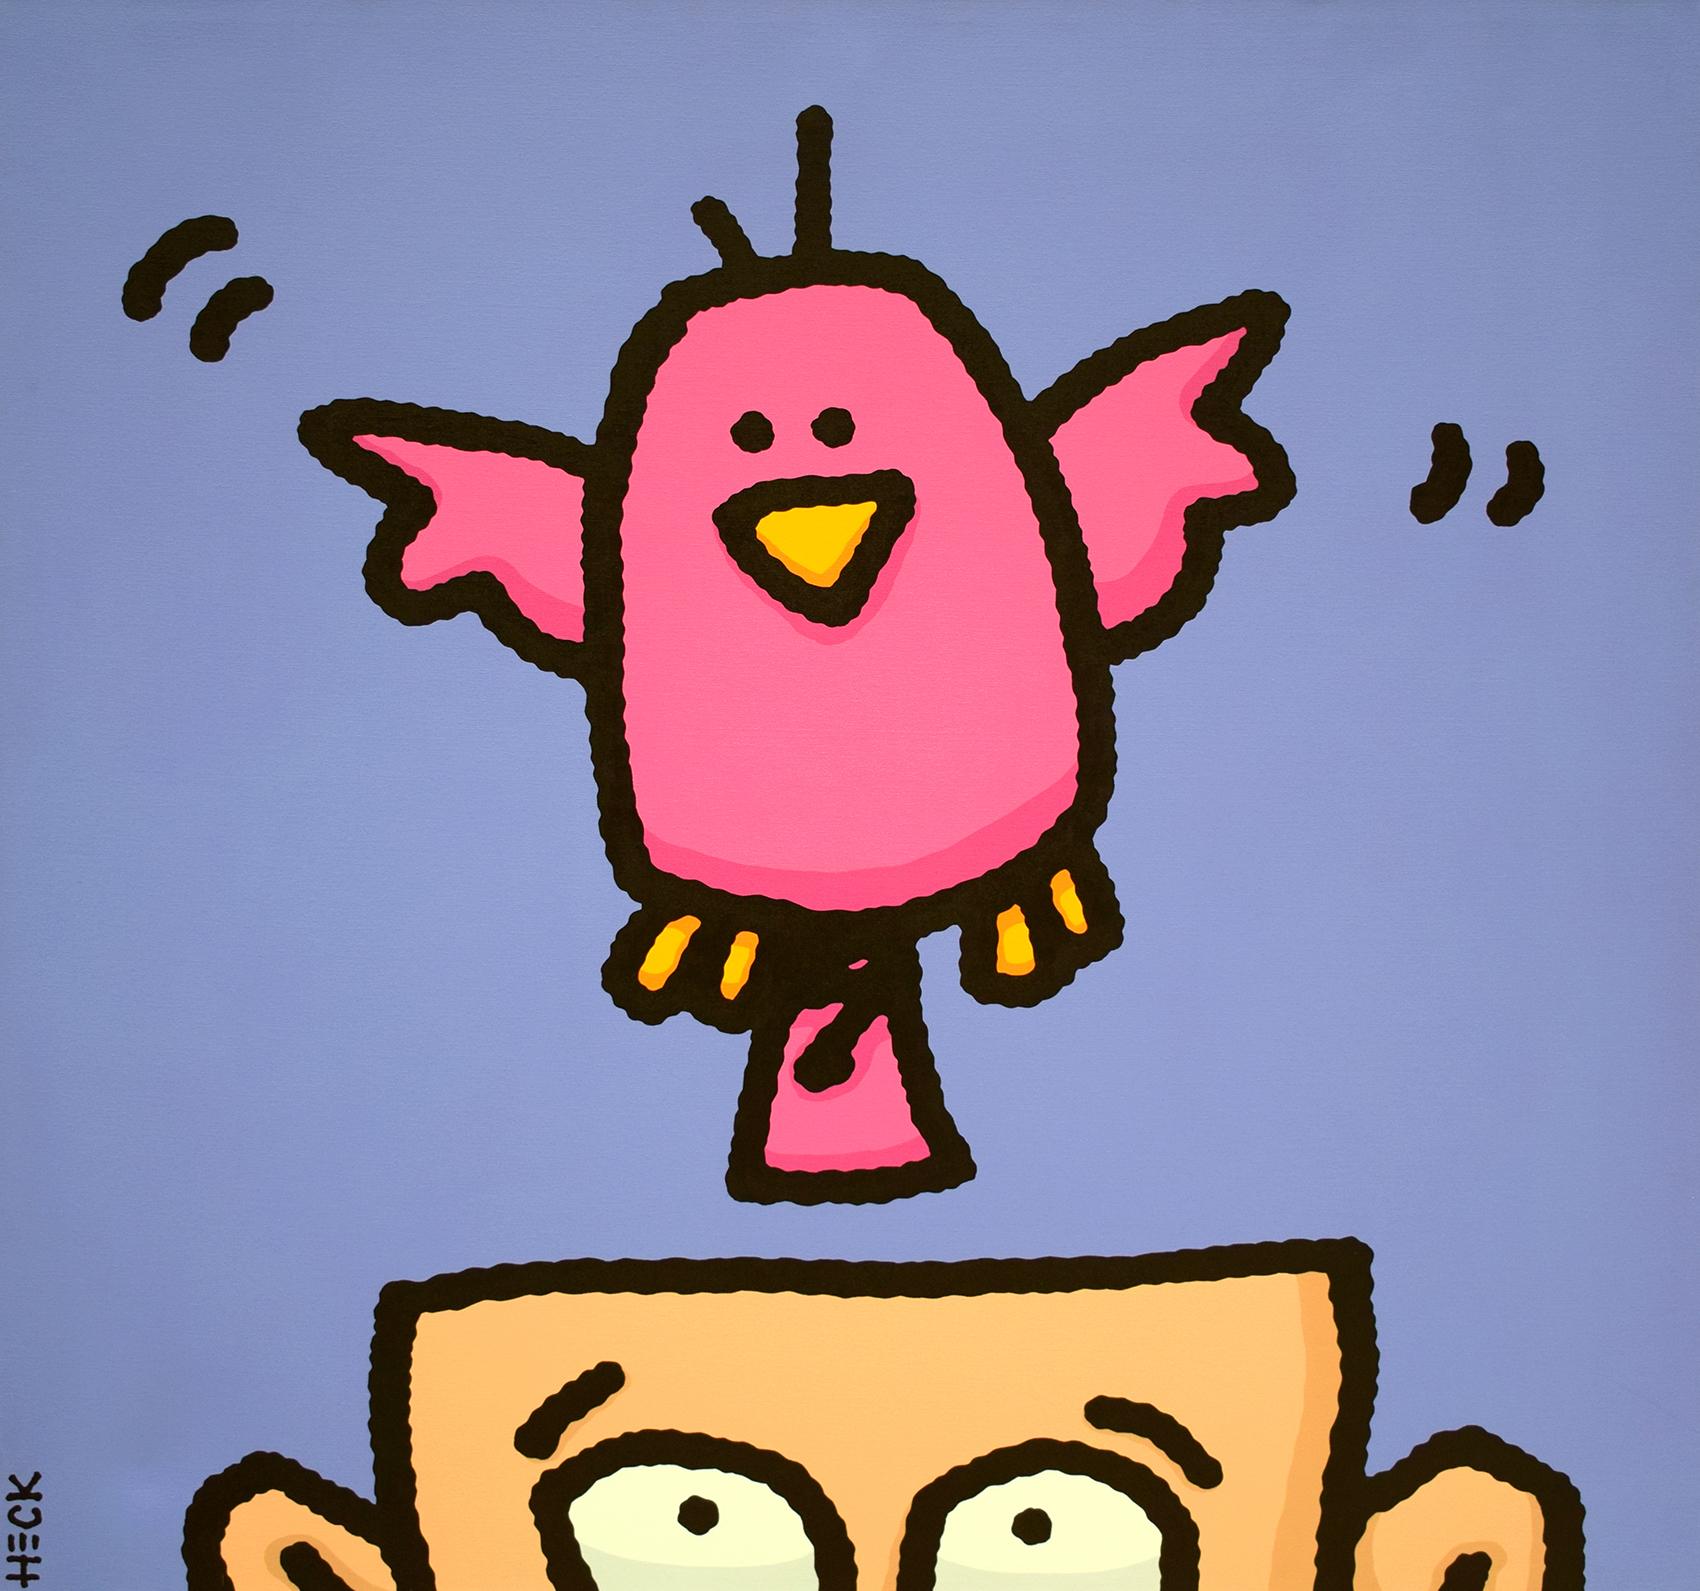 Ed Heck - Bird Brain outside the Box , 6575-006-185